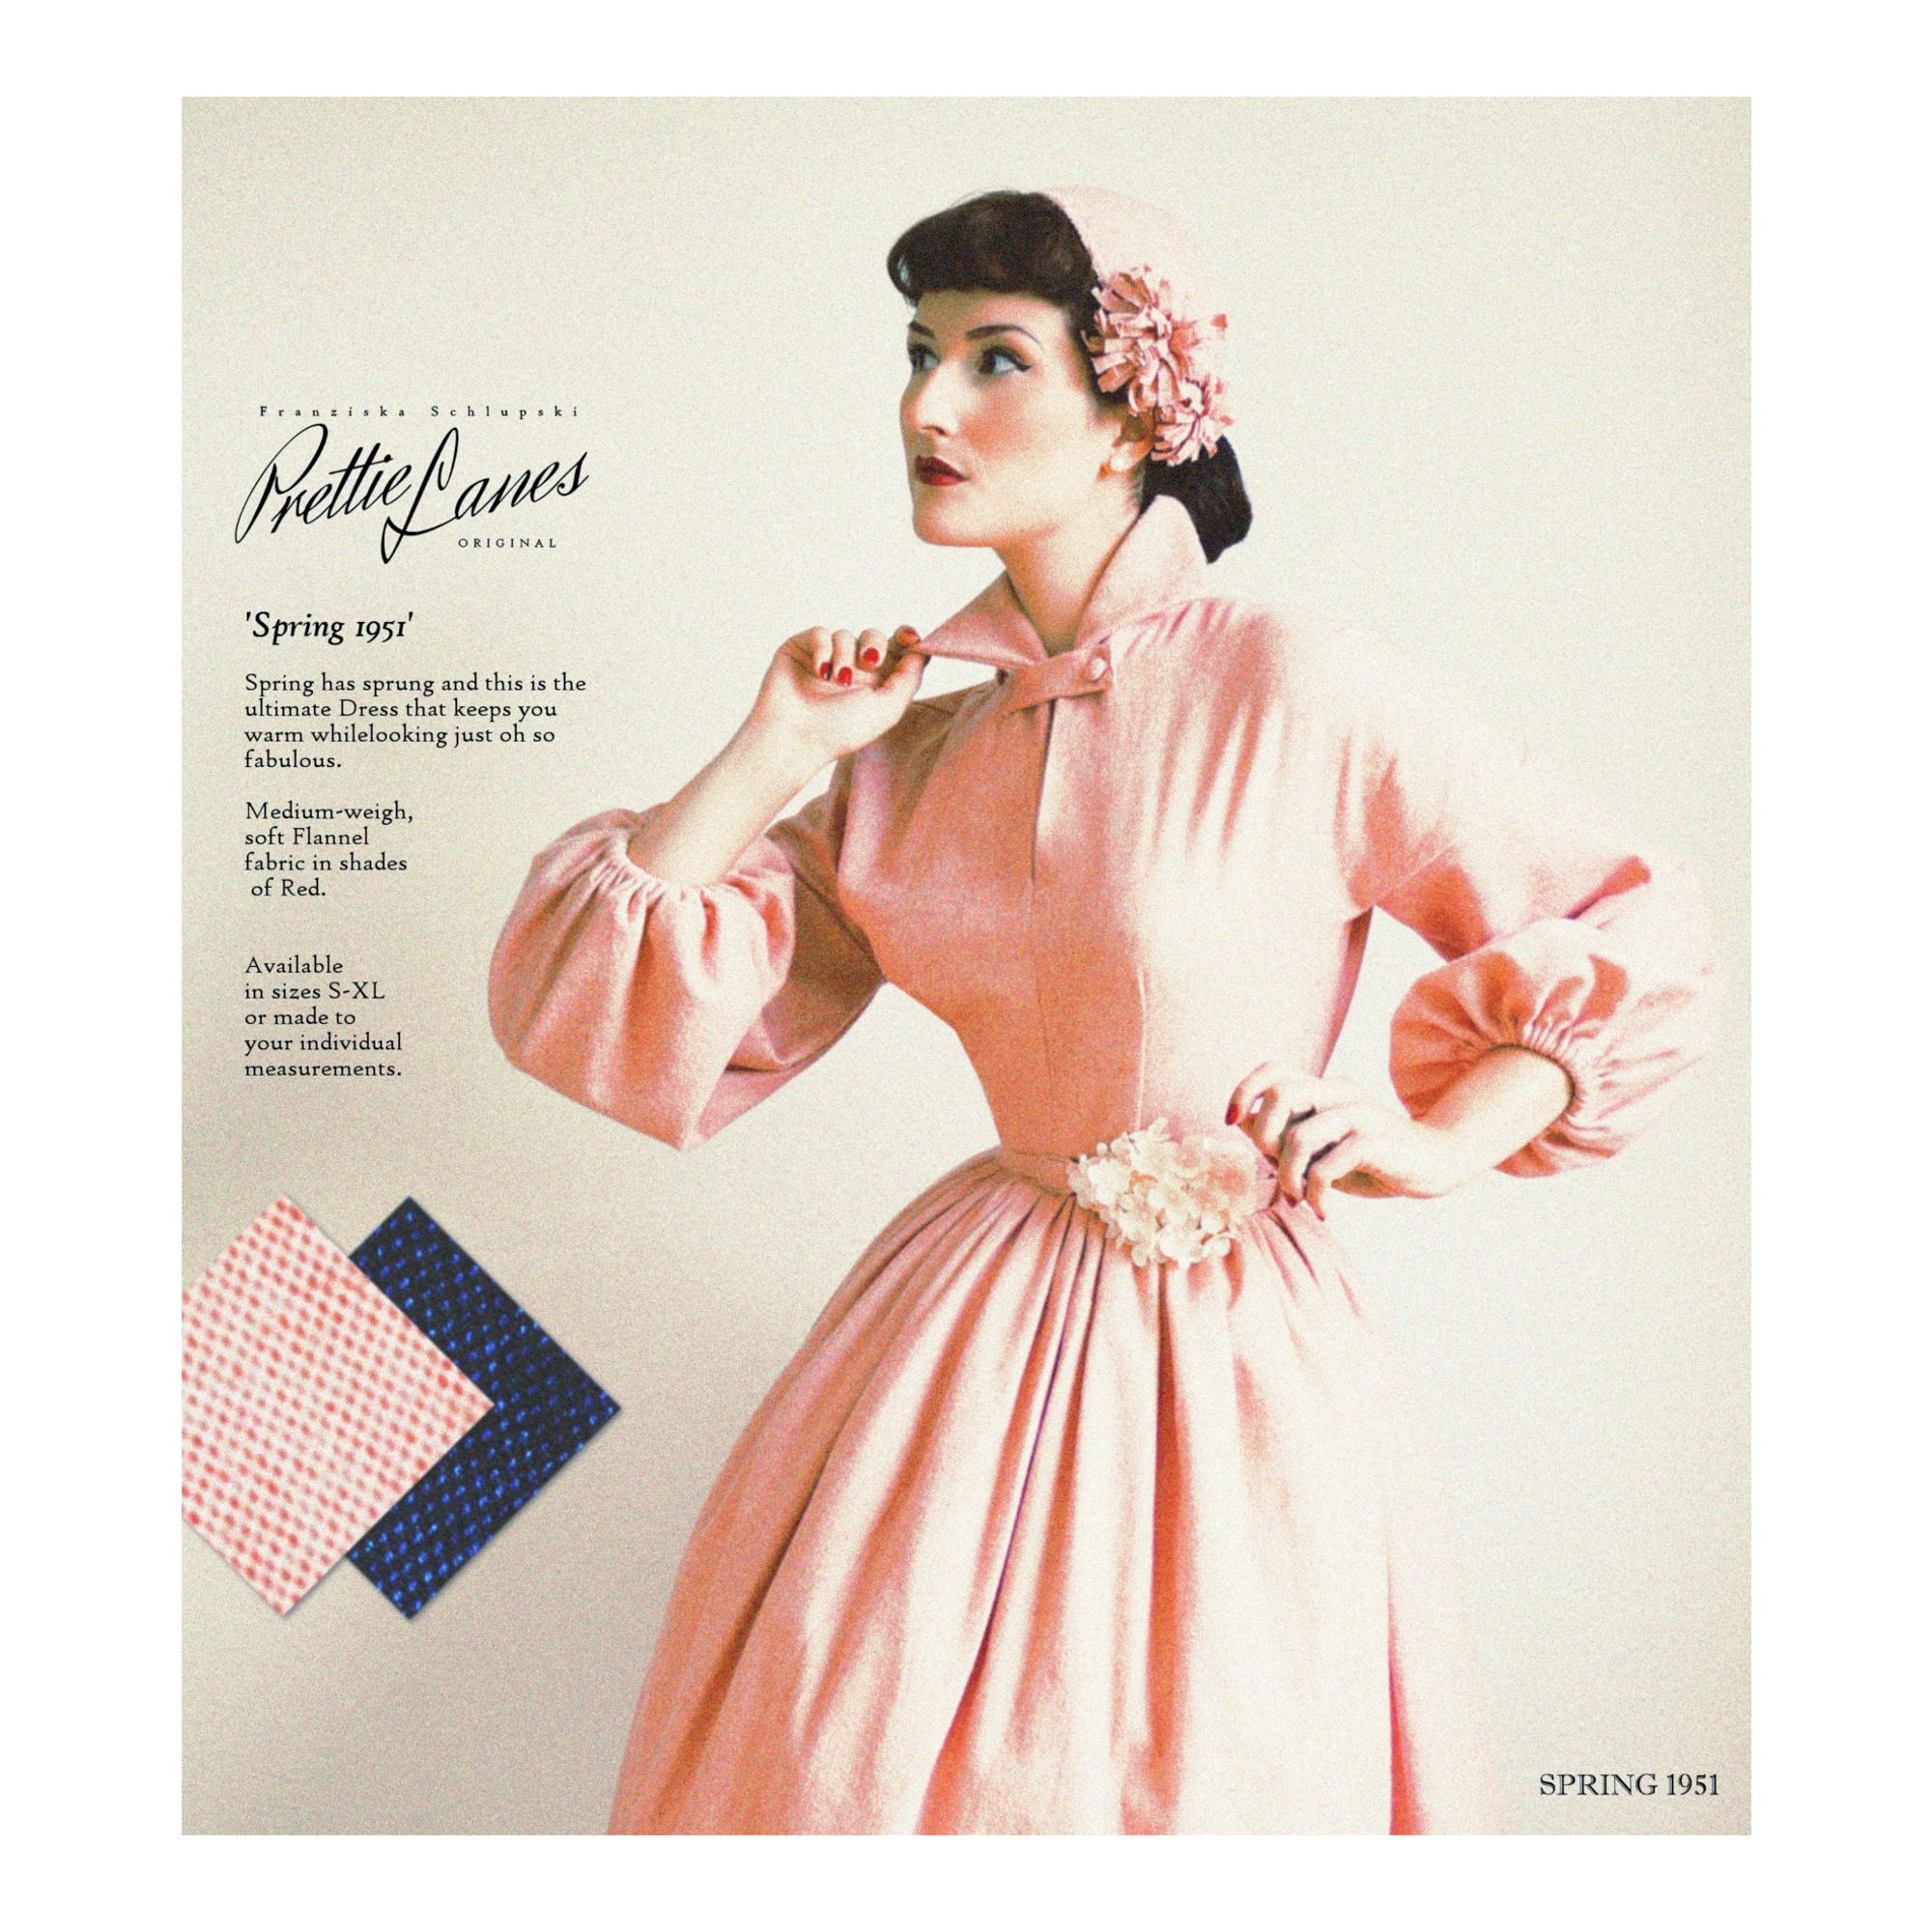 Dress Spring 1951 By Prettie Lanes Www Prettielanes Com 50s Prettielanes Fashiondesign 40s Vintage Vintageinspire Spring Dresses Flannel Dress Dresses